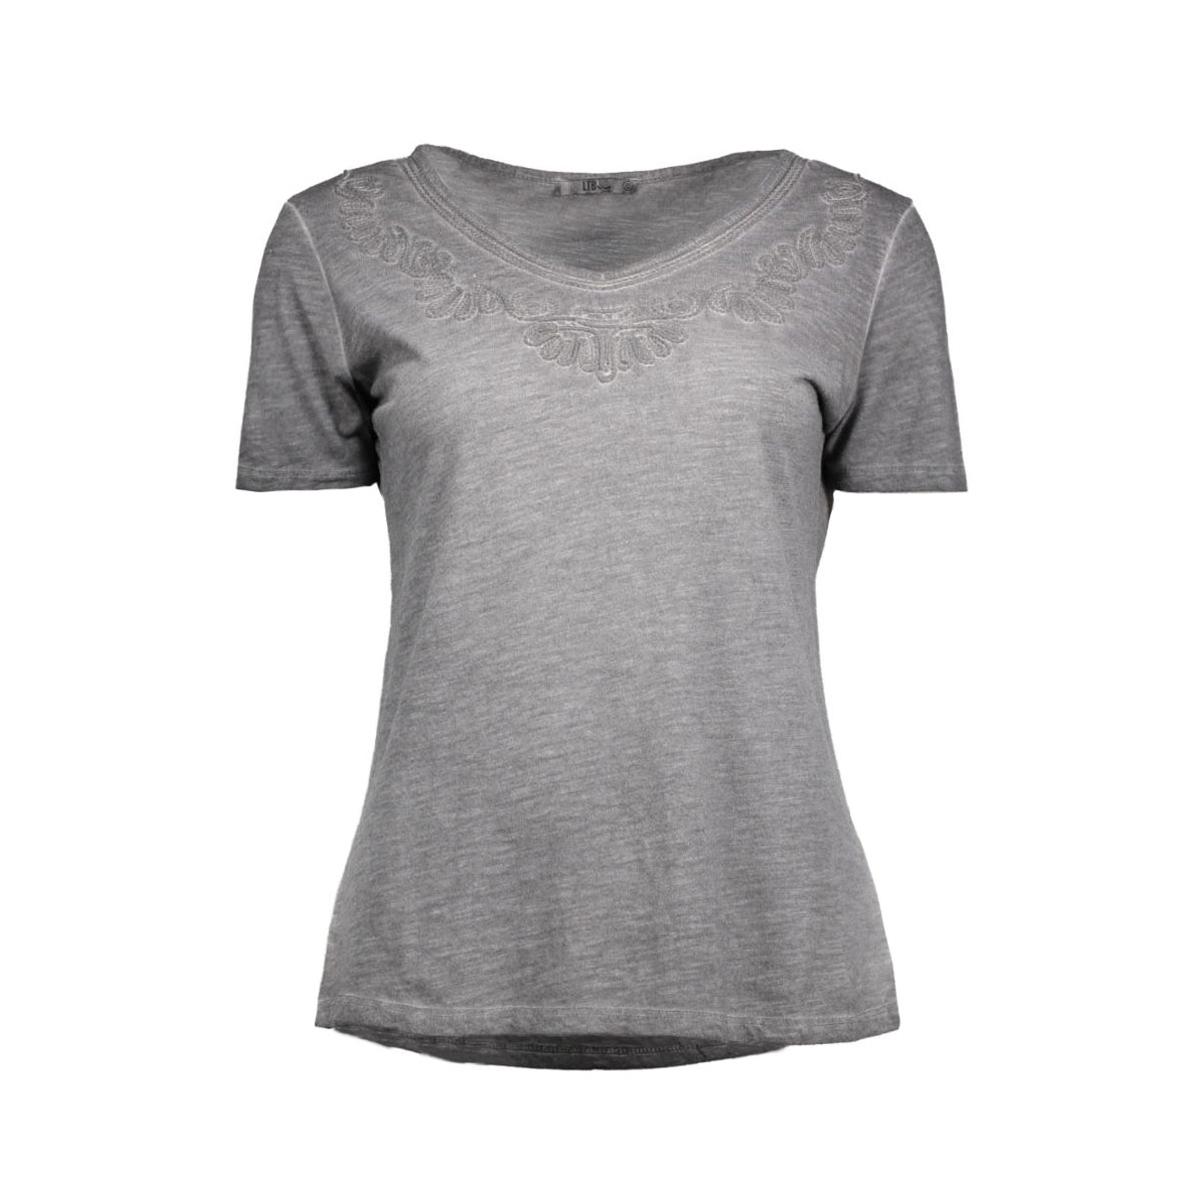 111780057.60310 ltb t-shirt nirsen oil antra